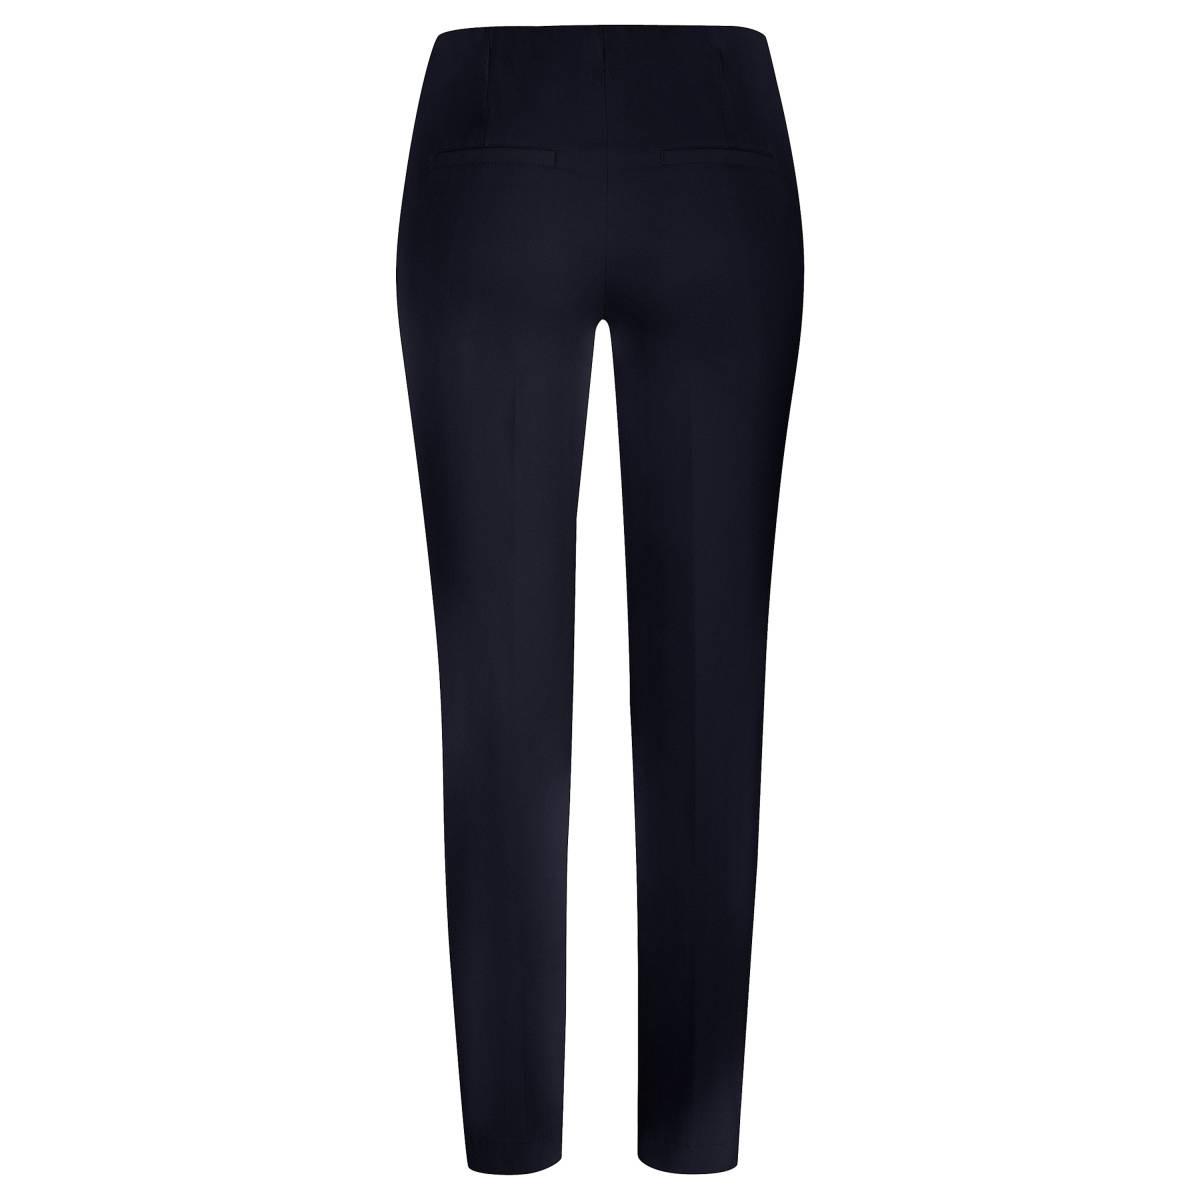 CAMBIO pantalon ros L29-8